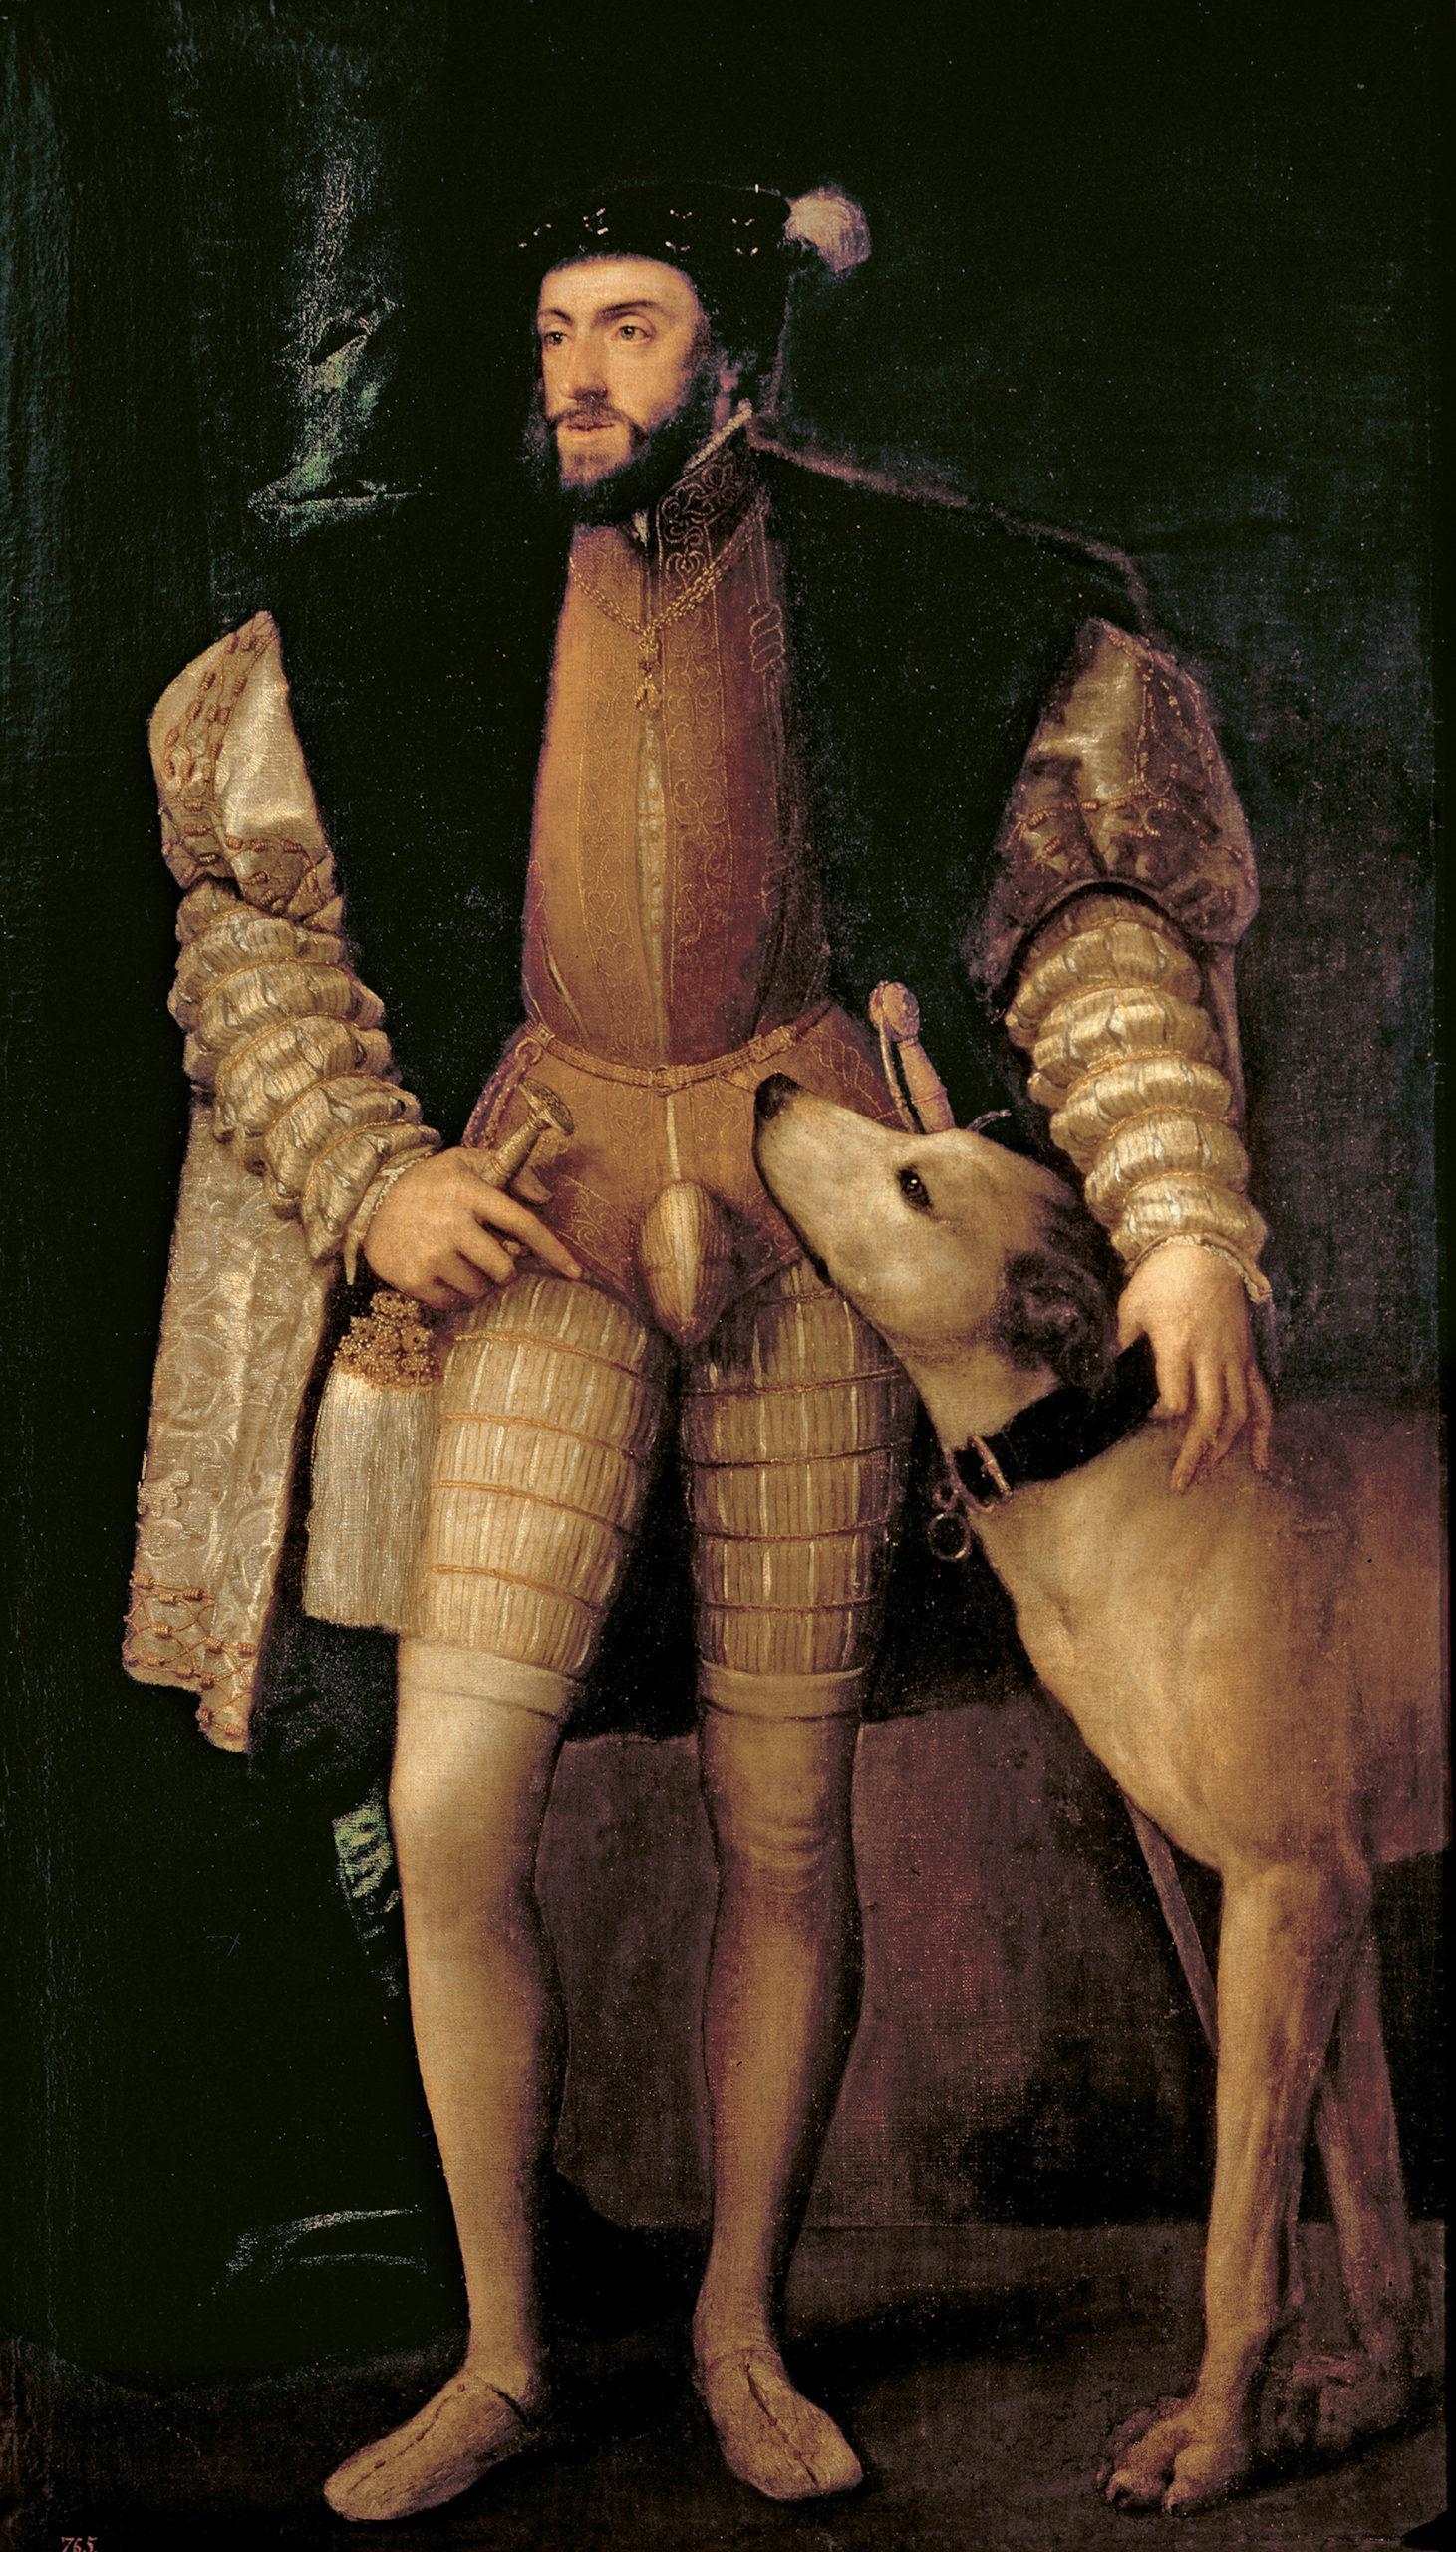 Titian, Emperor Charles V with a Dog, 1533. Museo Nacional del Prado, Madrid